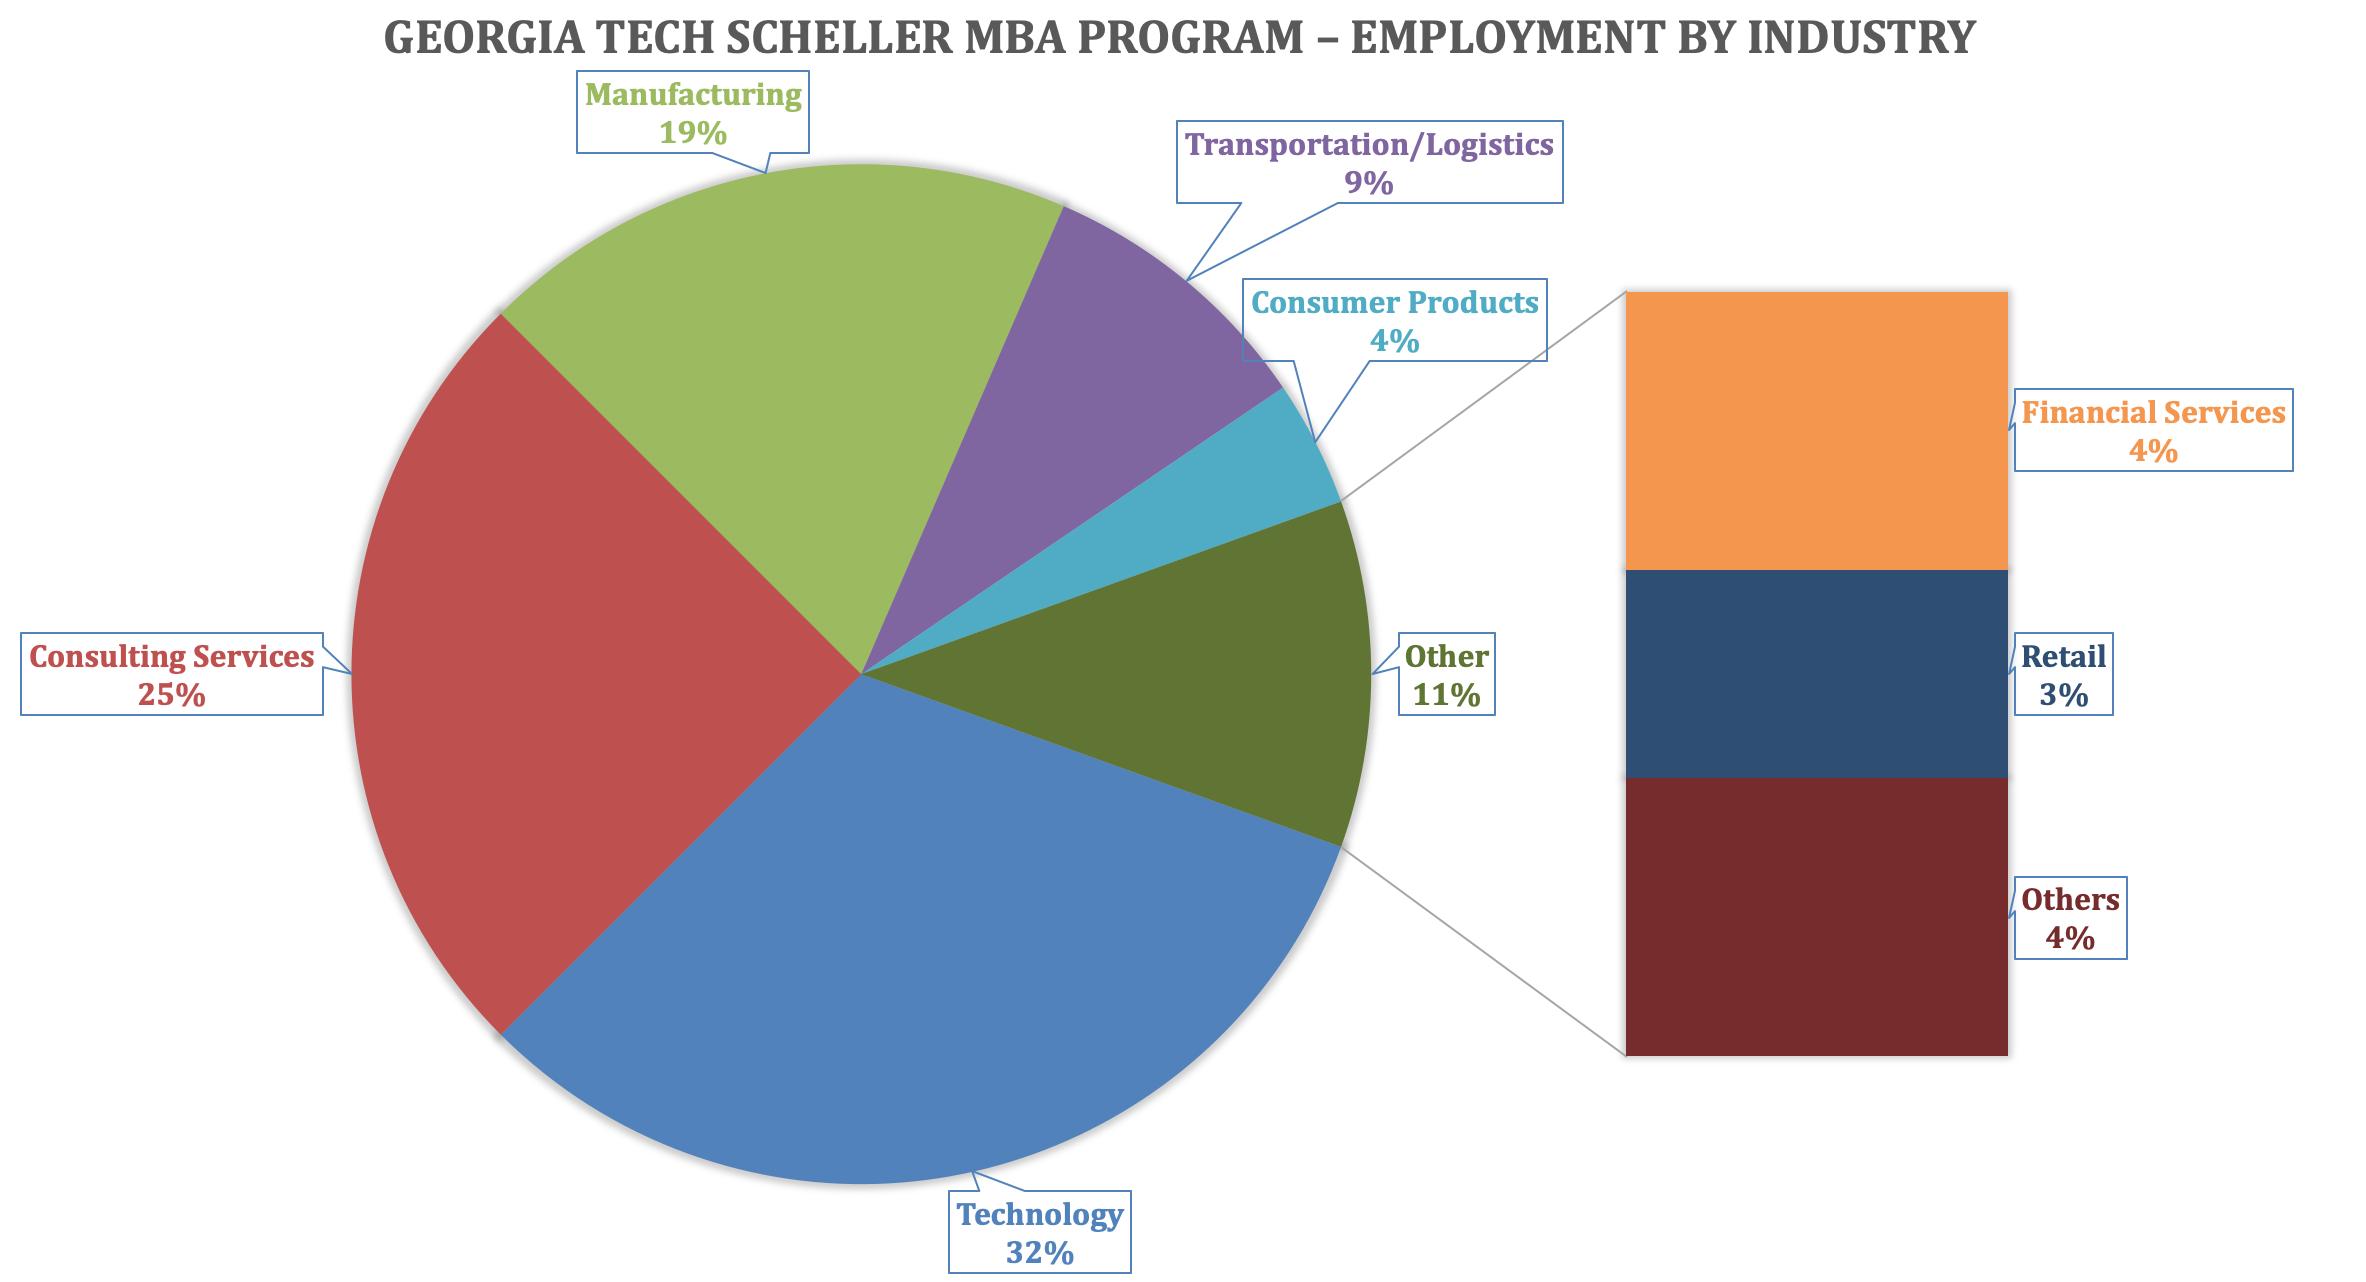 Georgia Tech Scheller MBA Program - Employment by Industry